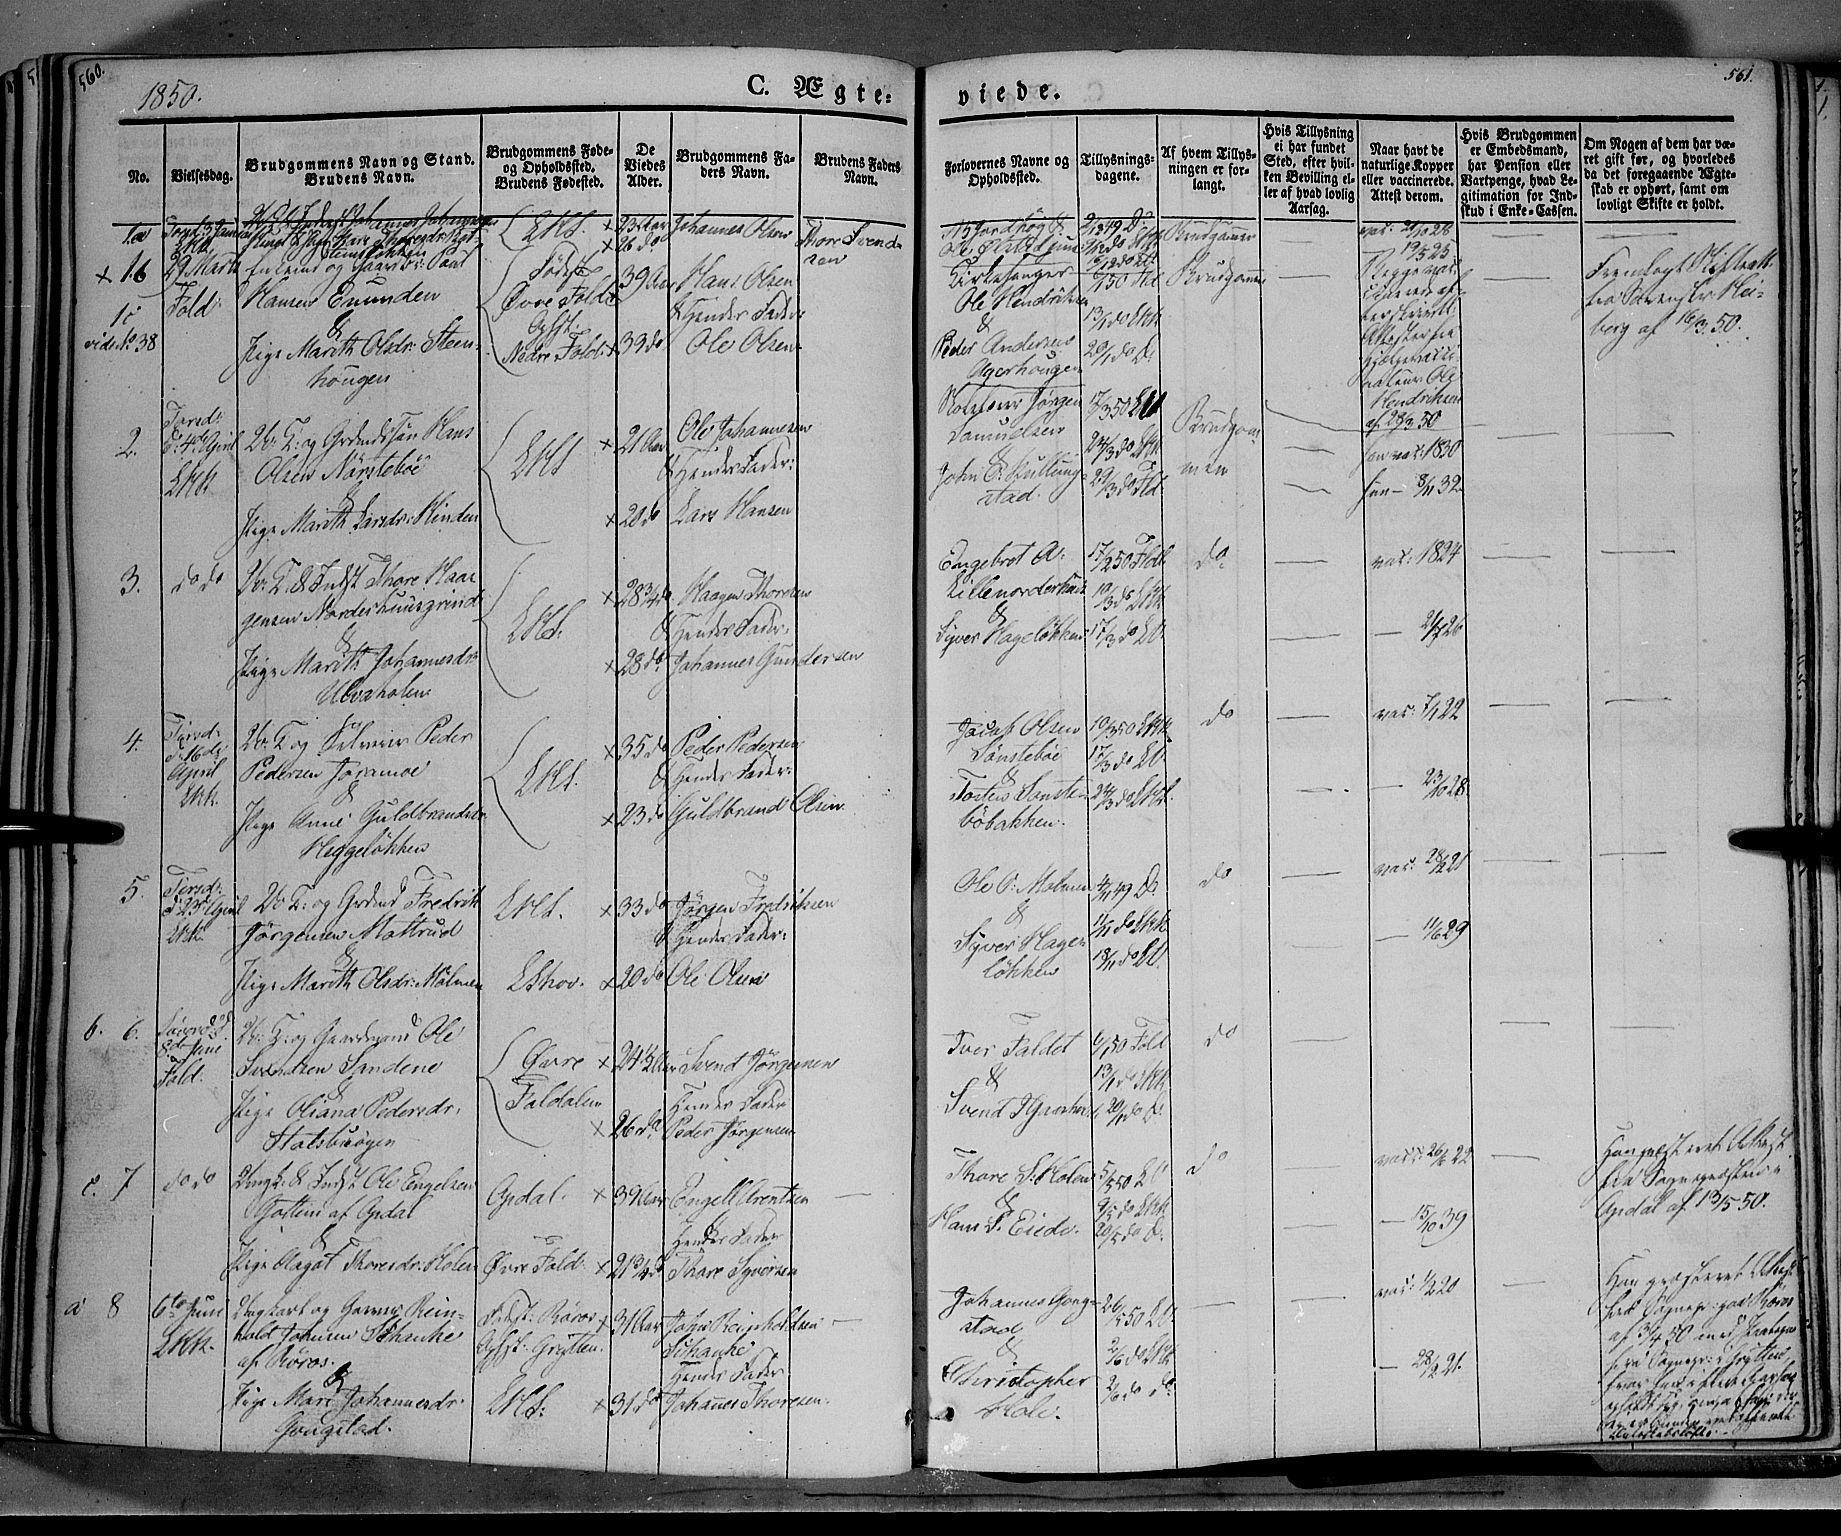 SAH, Lesja prestekontor, Ministerialbok nr. 6A, 1843-1854, s. 560-561